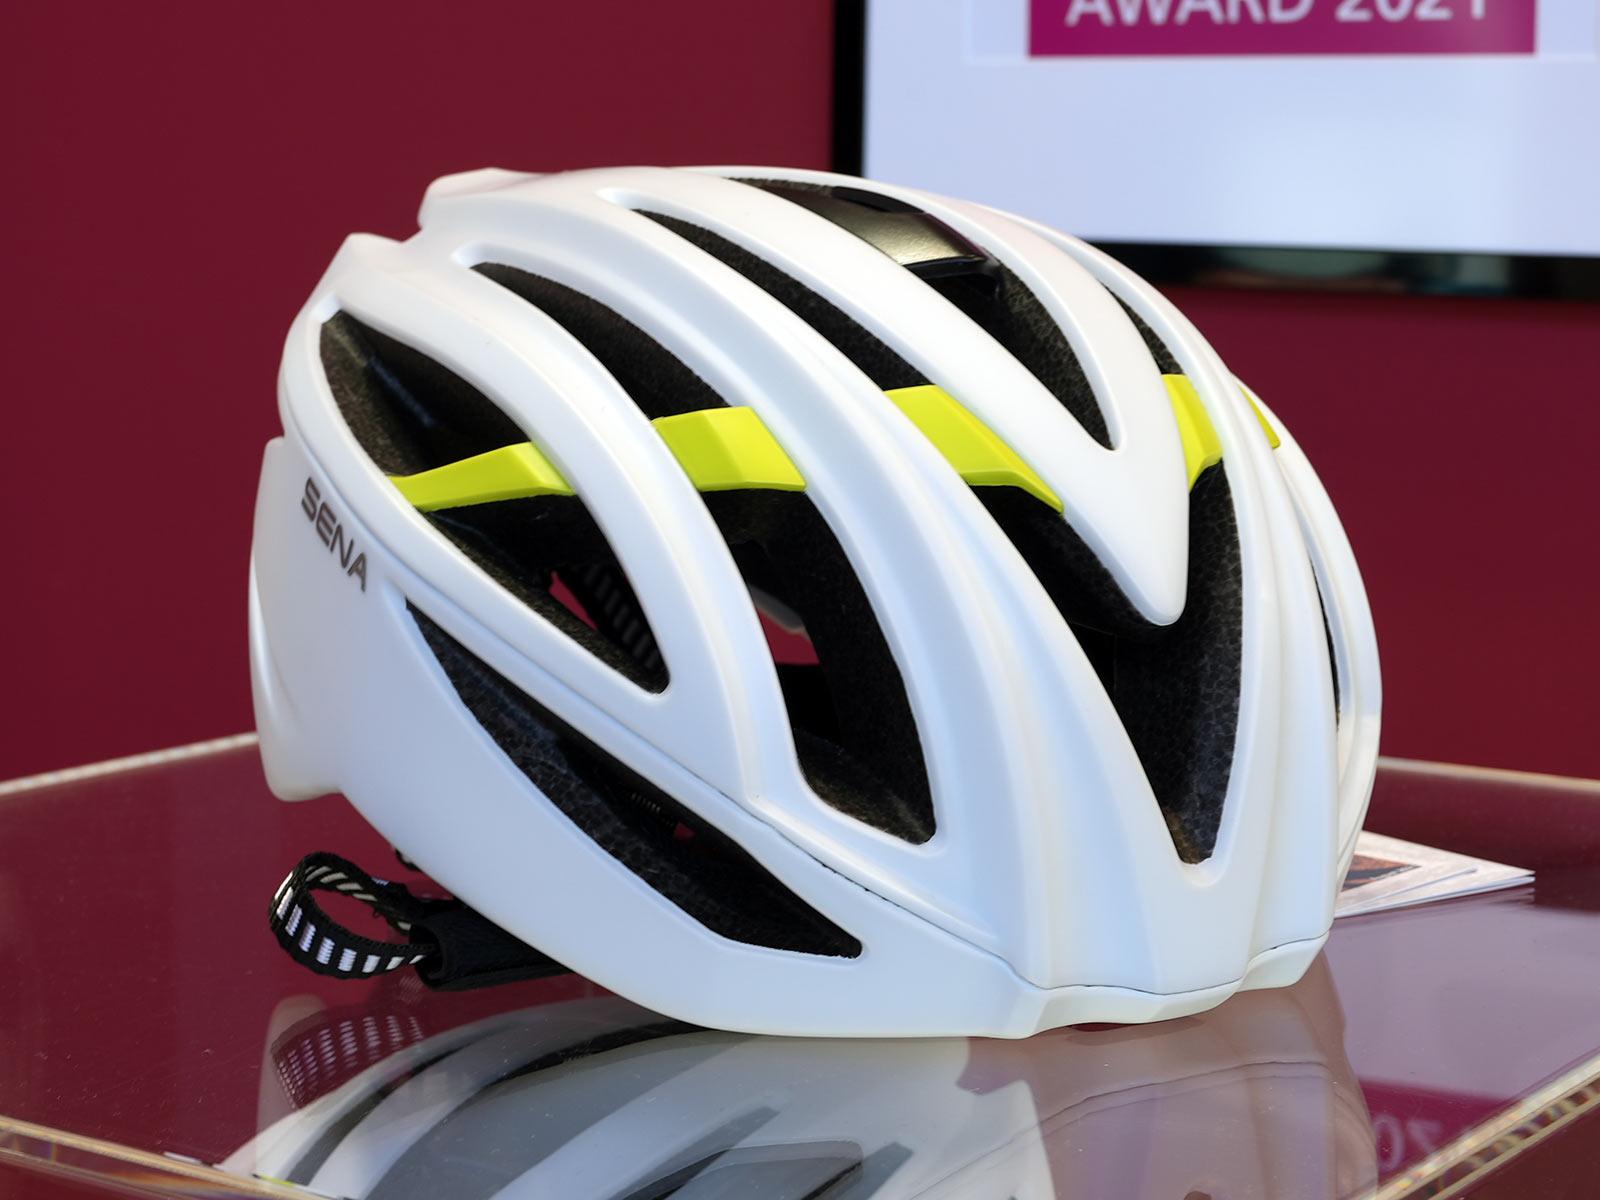 sena r2 road bike helmet with intercom wireless communication and bluetooth speaker